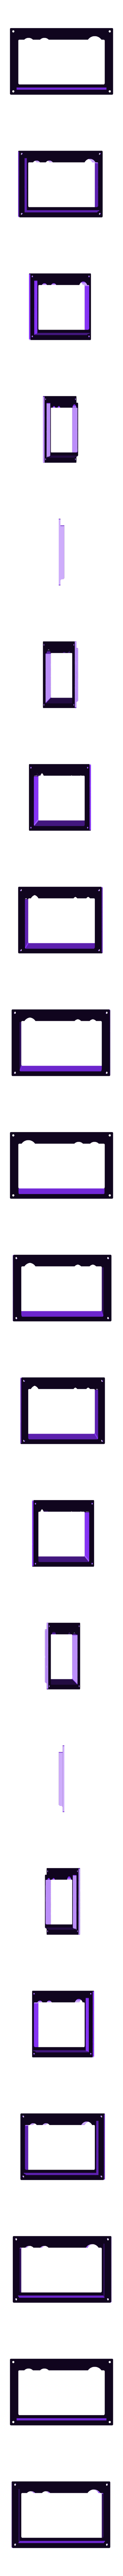 full_graphic_smart_controller_panel_mounting_window.stl Download free STL file Portable 3D Printer • 3D printable design, Job